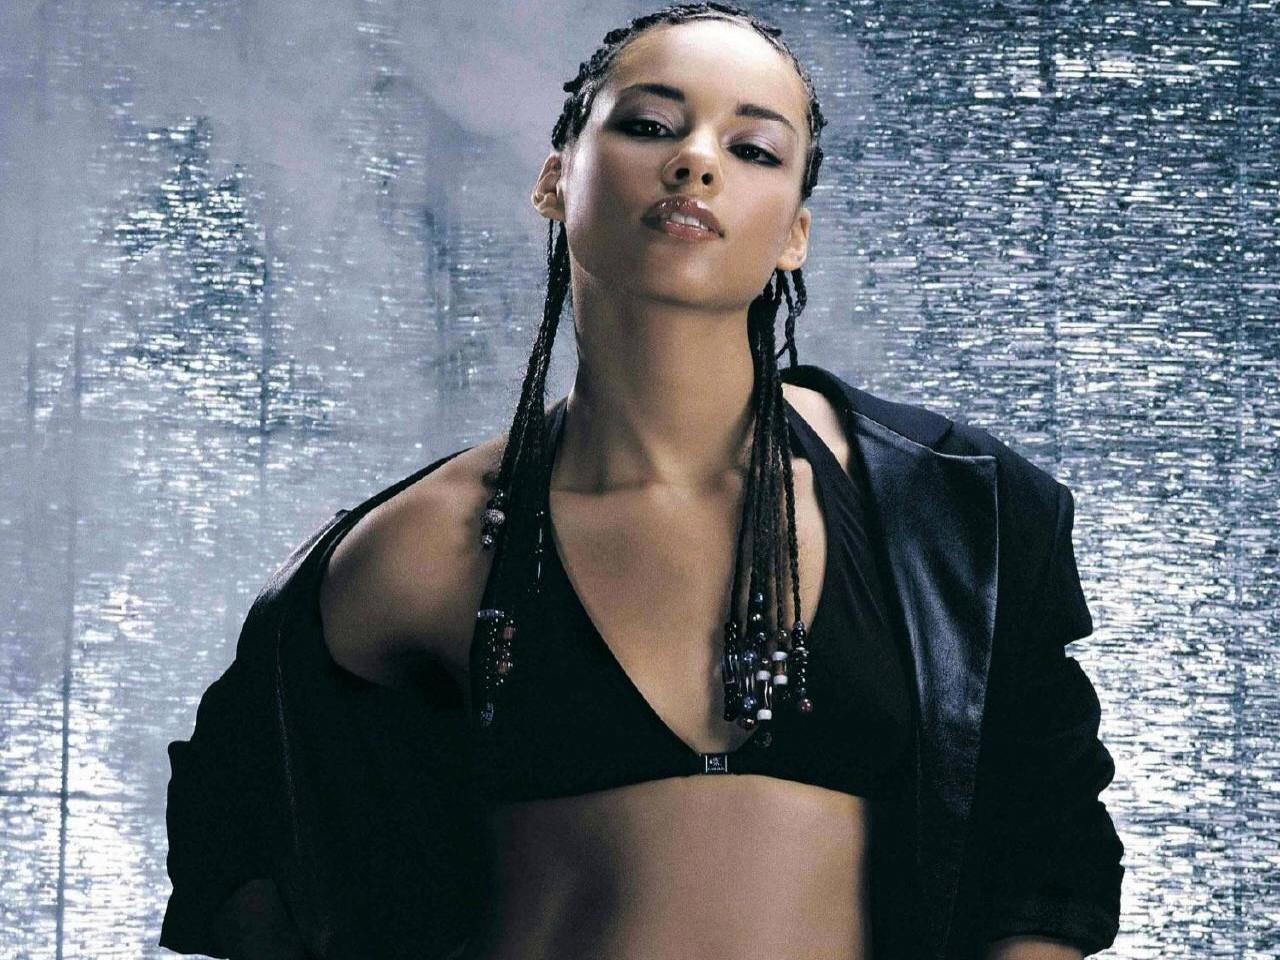 Wallpaper di Alicia Keys